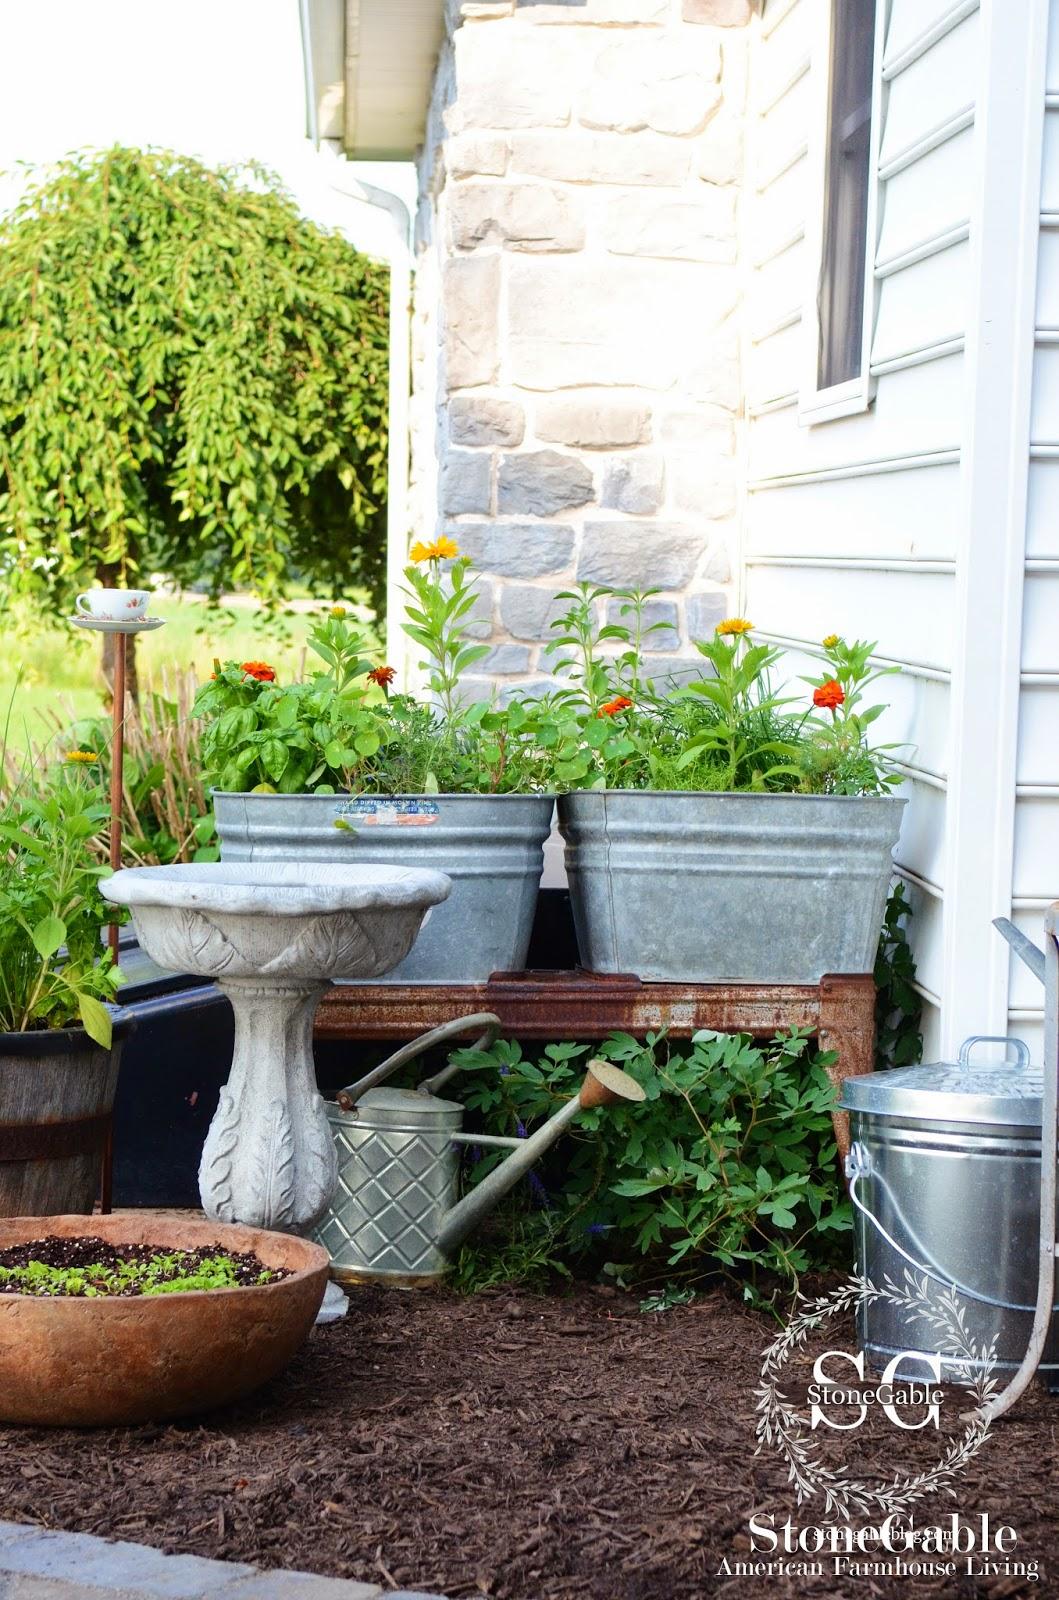 Kitchen Garden Blog Summer Potting Bench And Kitchen Garden Stonegable